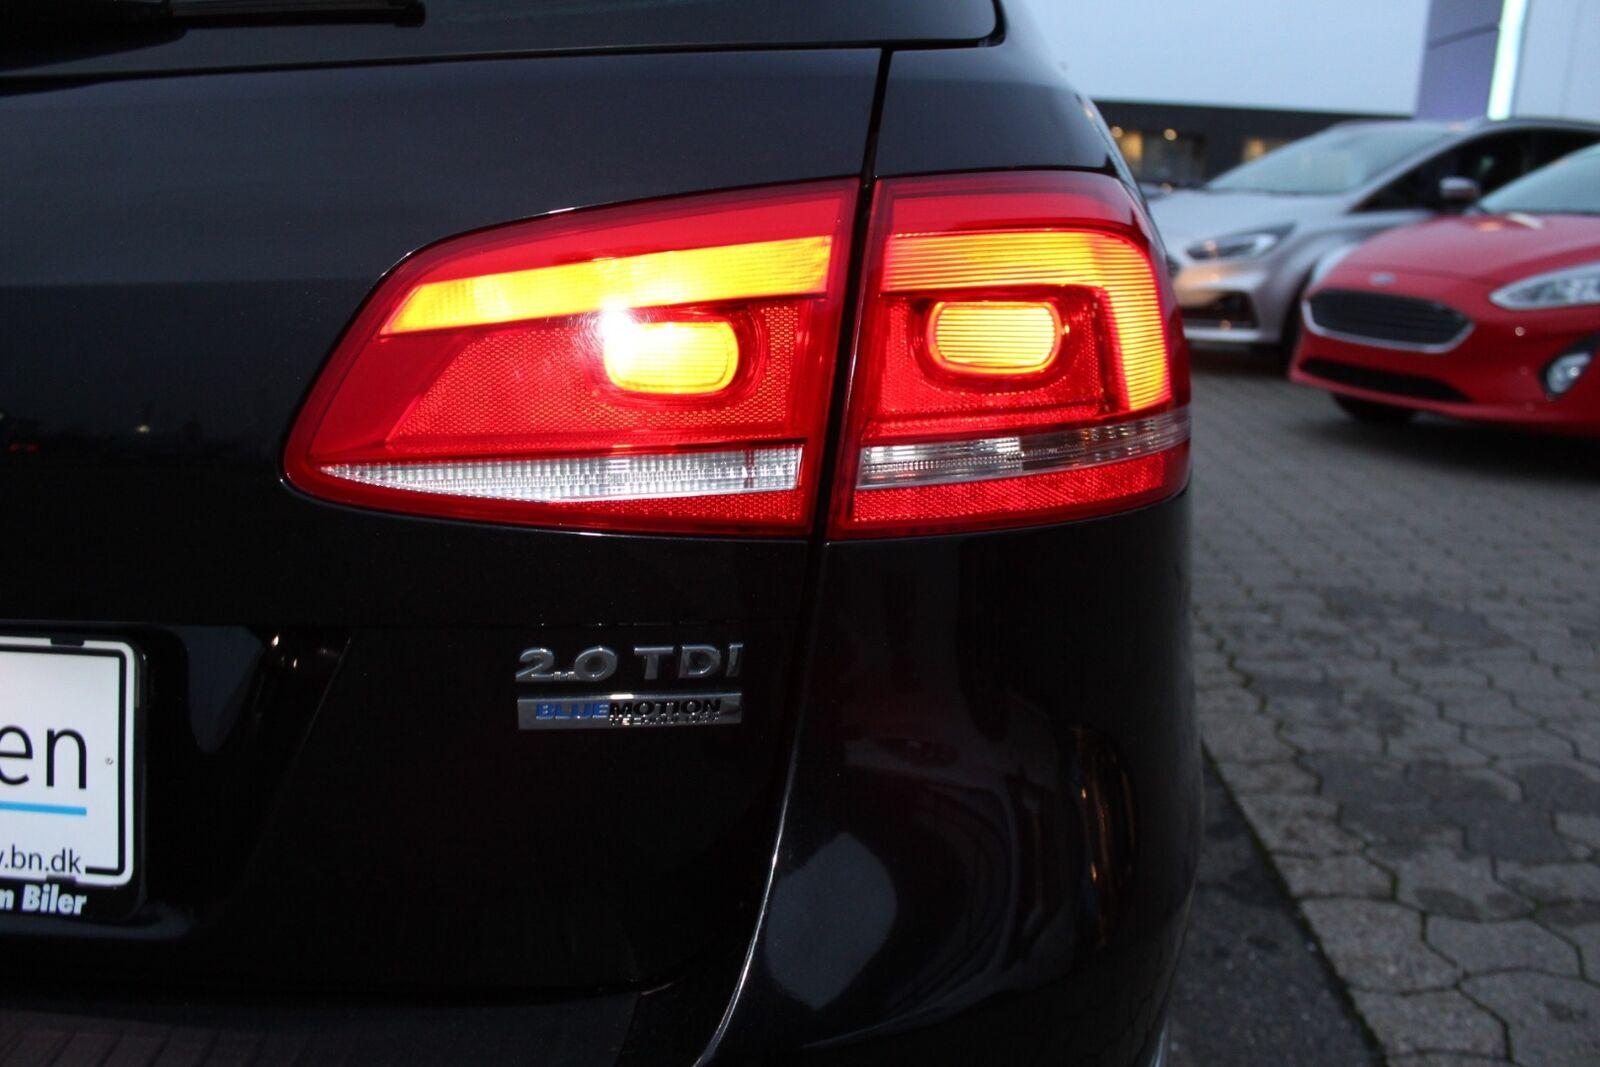 VW Passat 2,0 TDi 140 Comfortl. Vari. BMT - billede 3